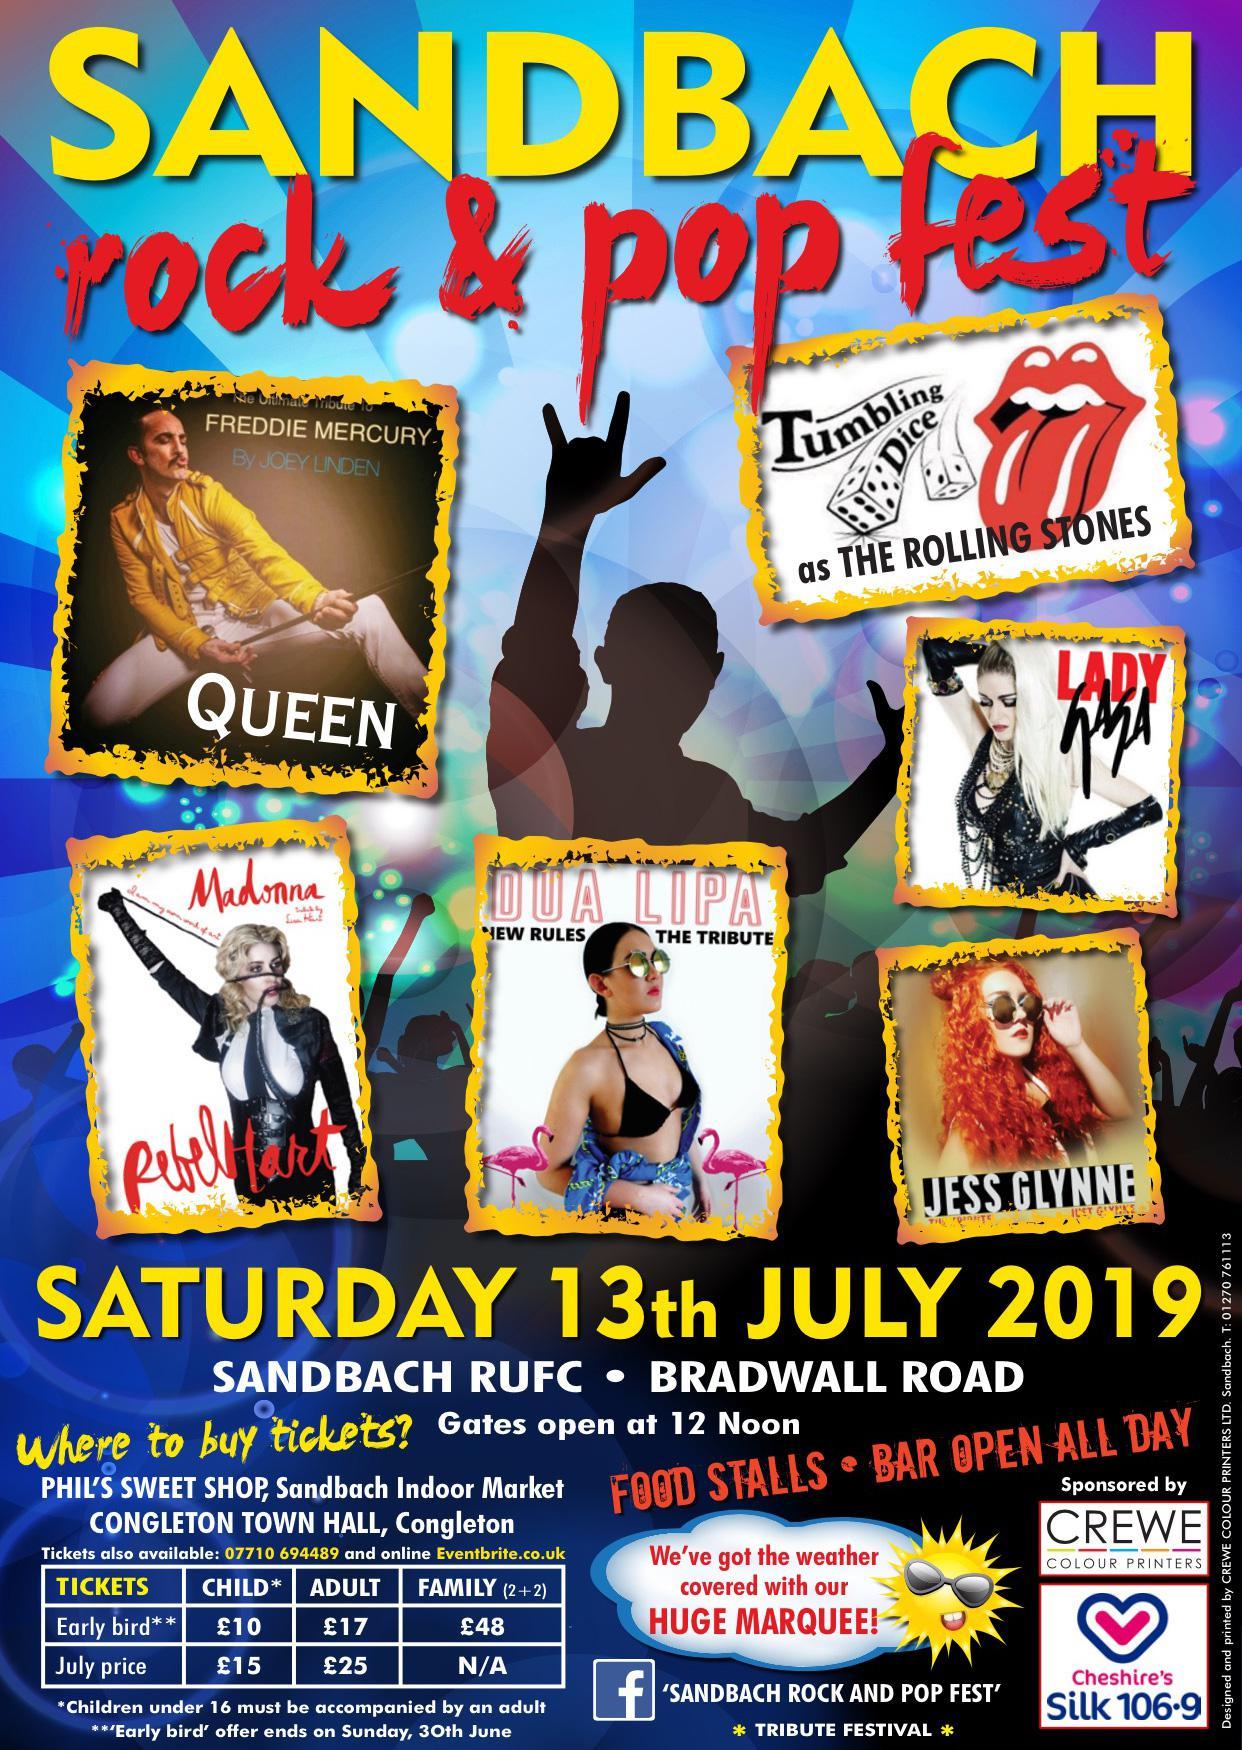 SANDBACH ROCK & POP FESTIVAL